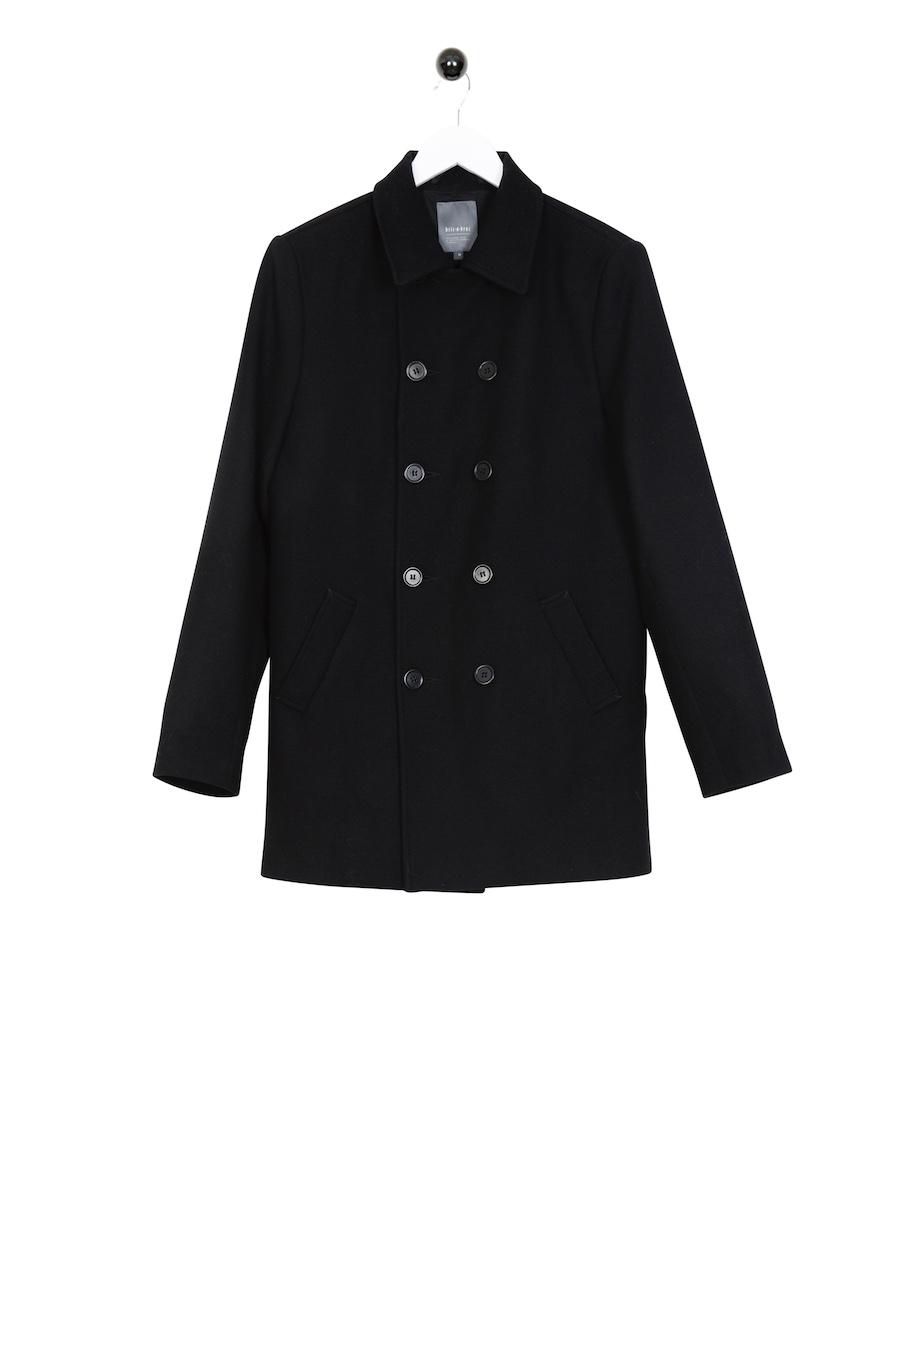 Claigan Jacket